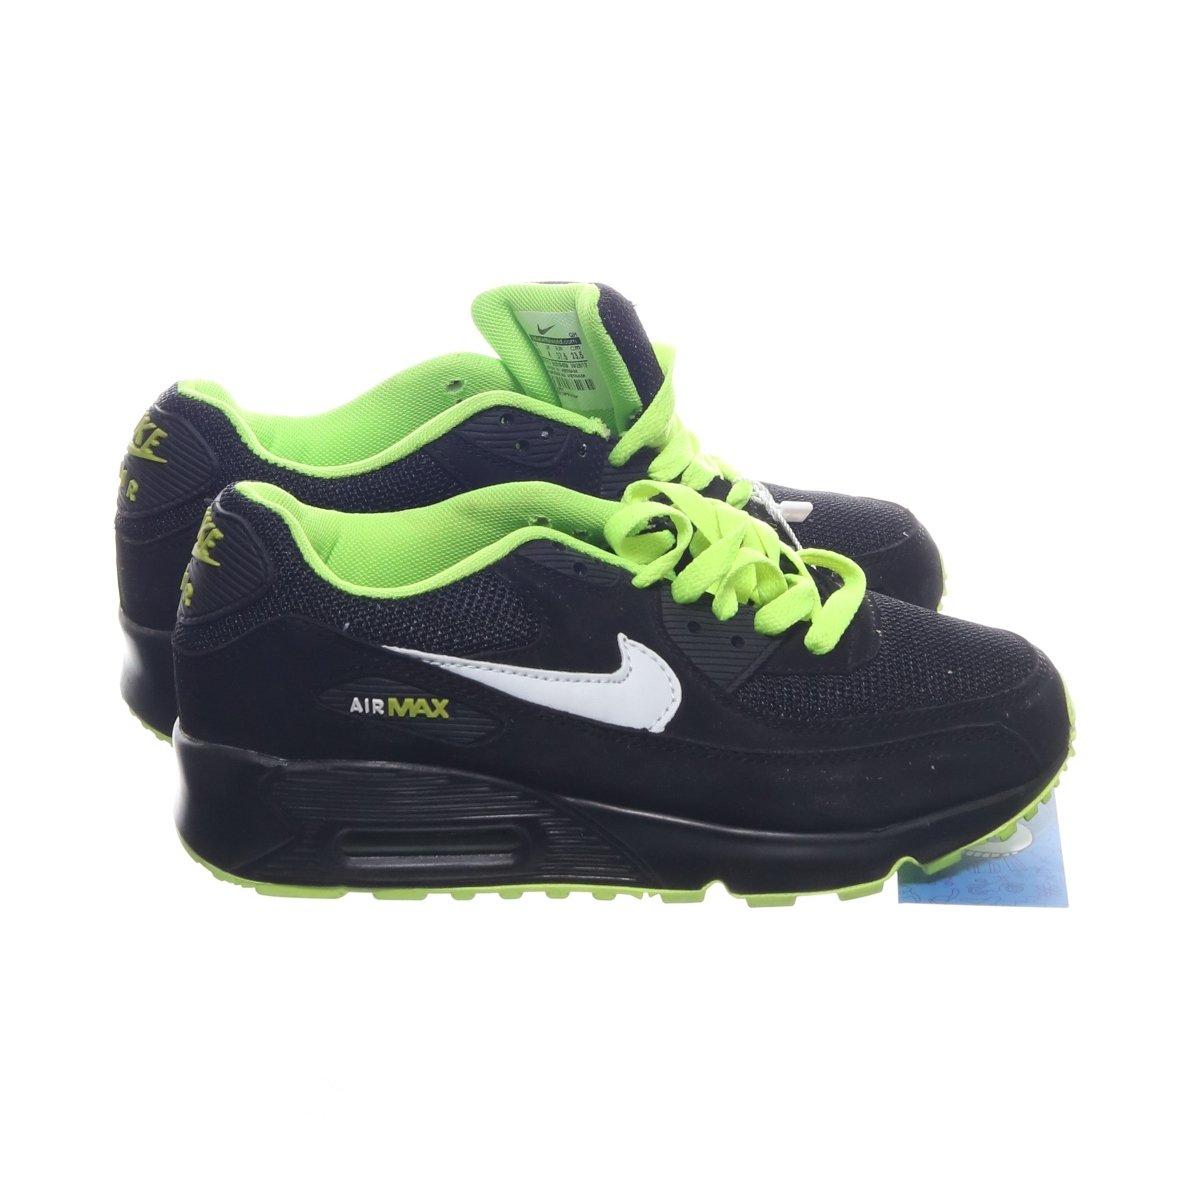 Nike Air Max, Sneakers, Strl: 37,5, SvartGul (359259190) ?